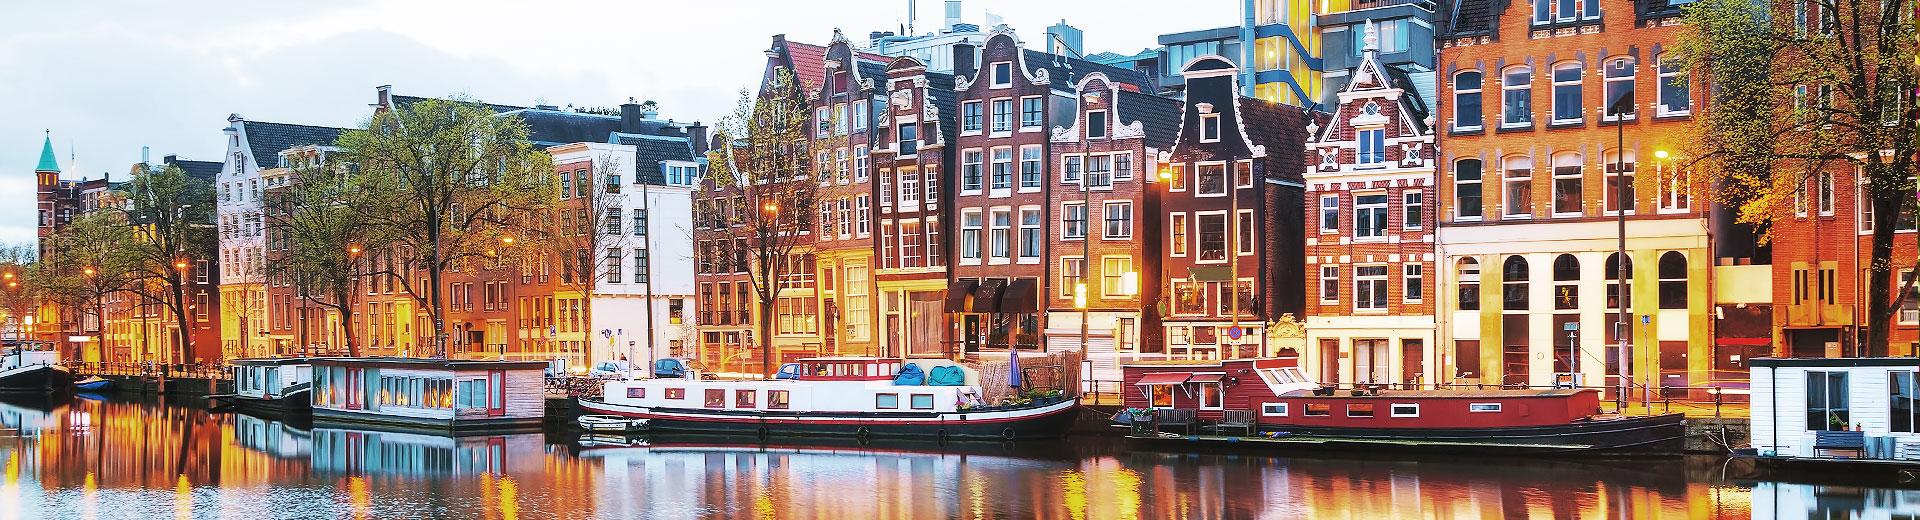 Escapade à Amsterdam